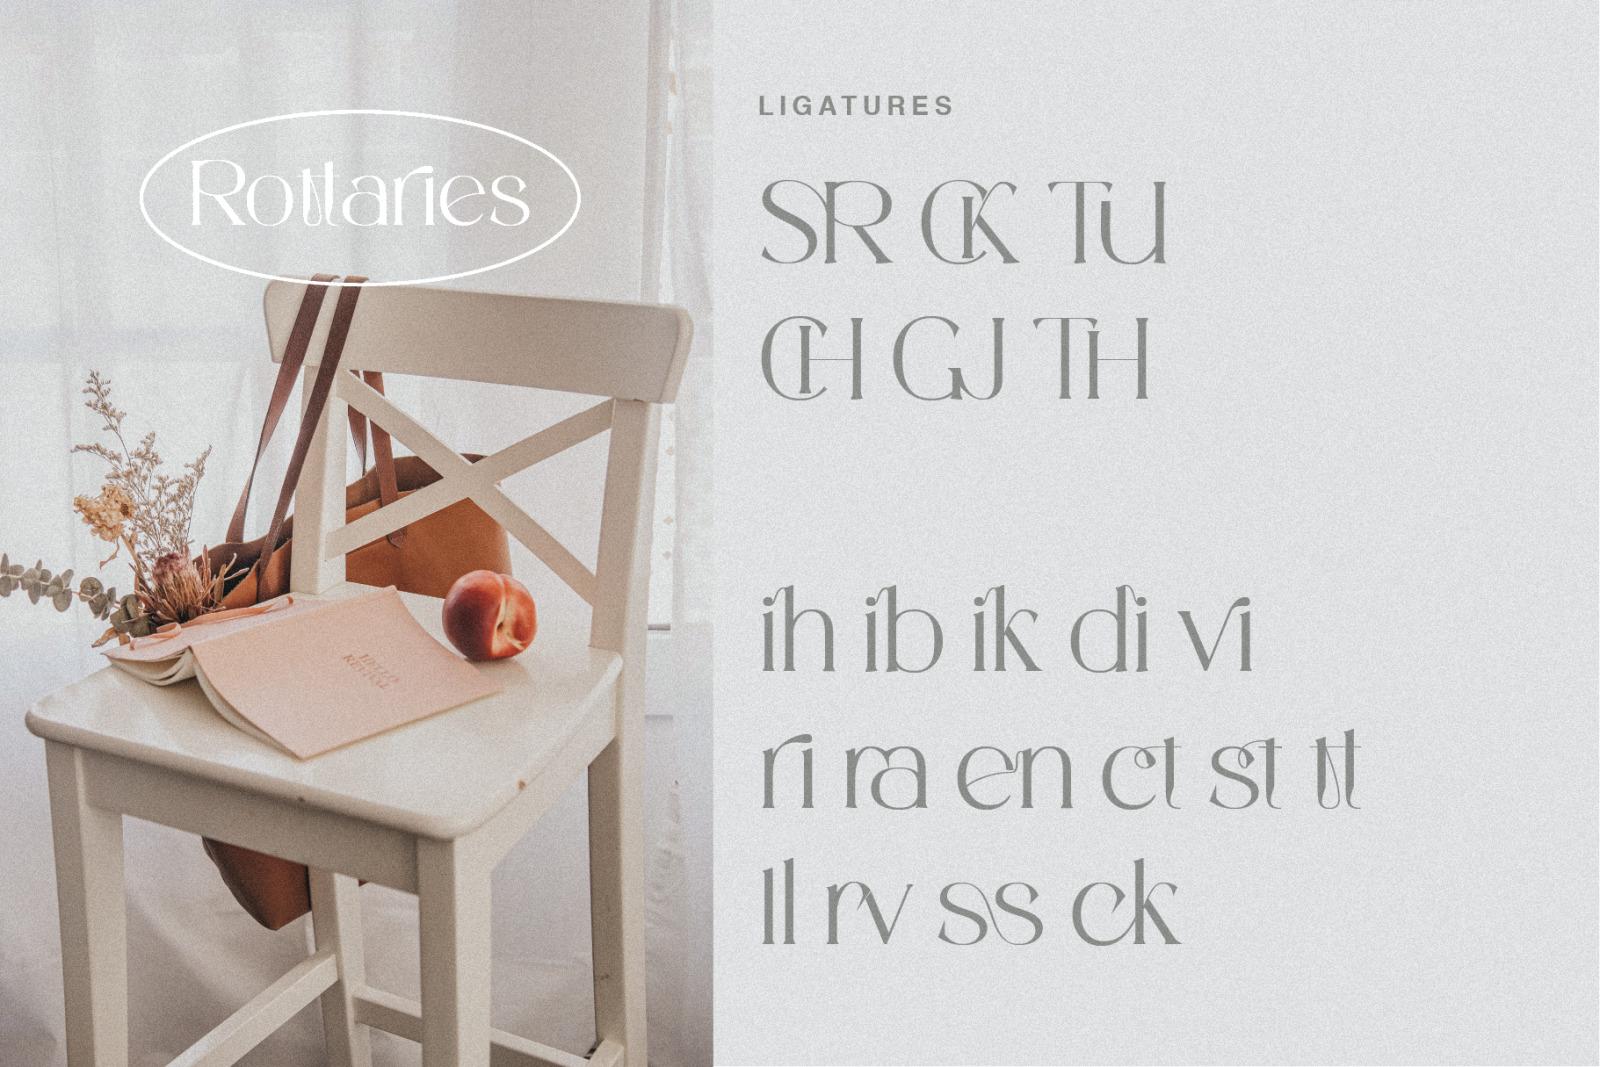 Rottaries - Modern Unique Typeface